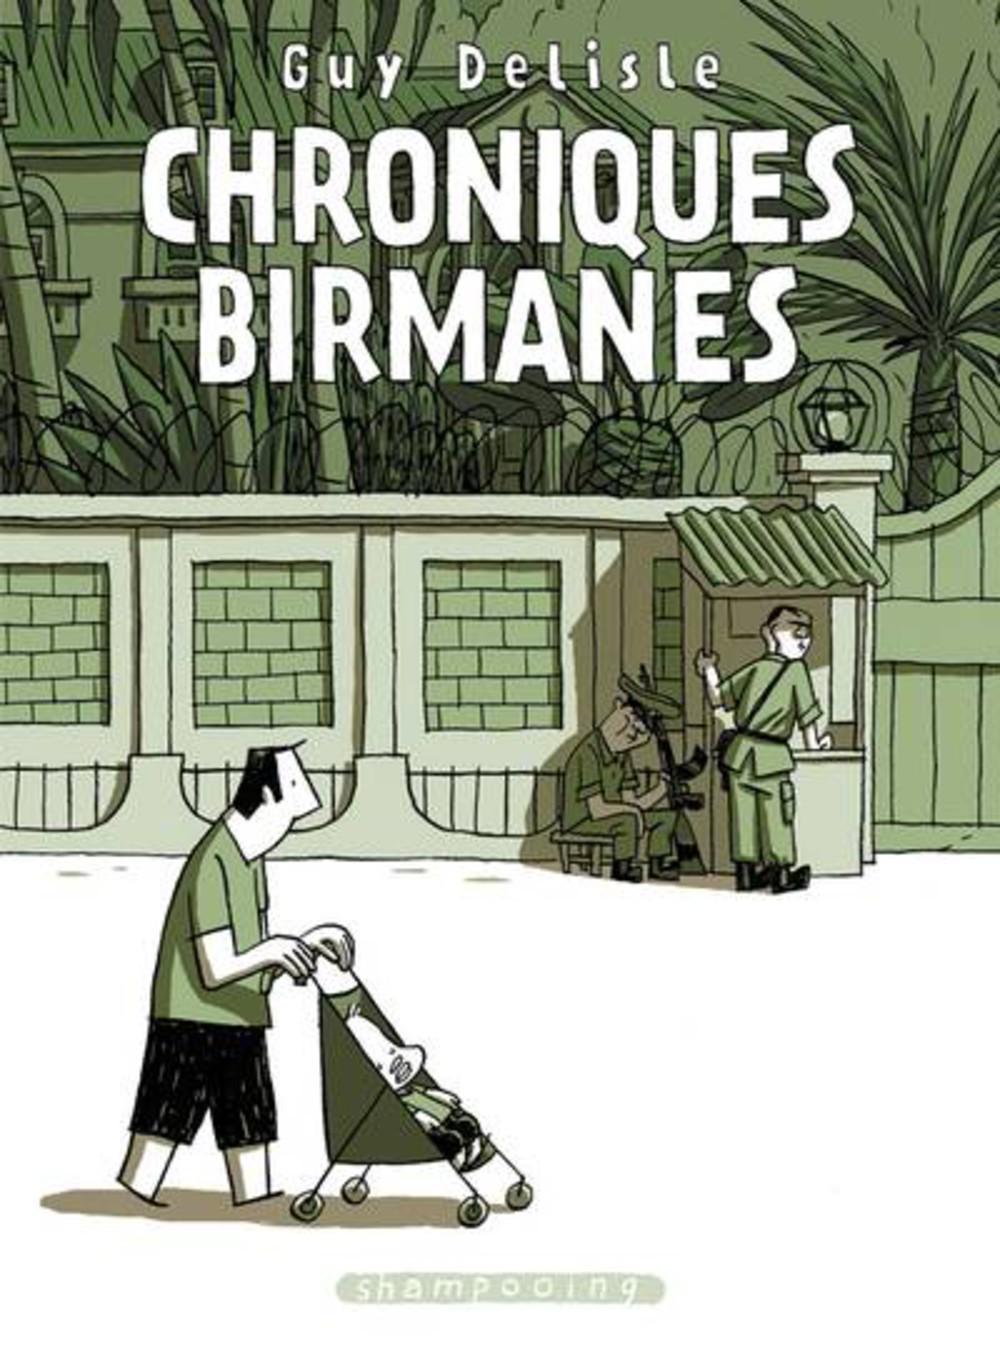 Chroniques birmanes, de Guy Delisle